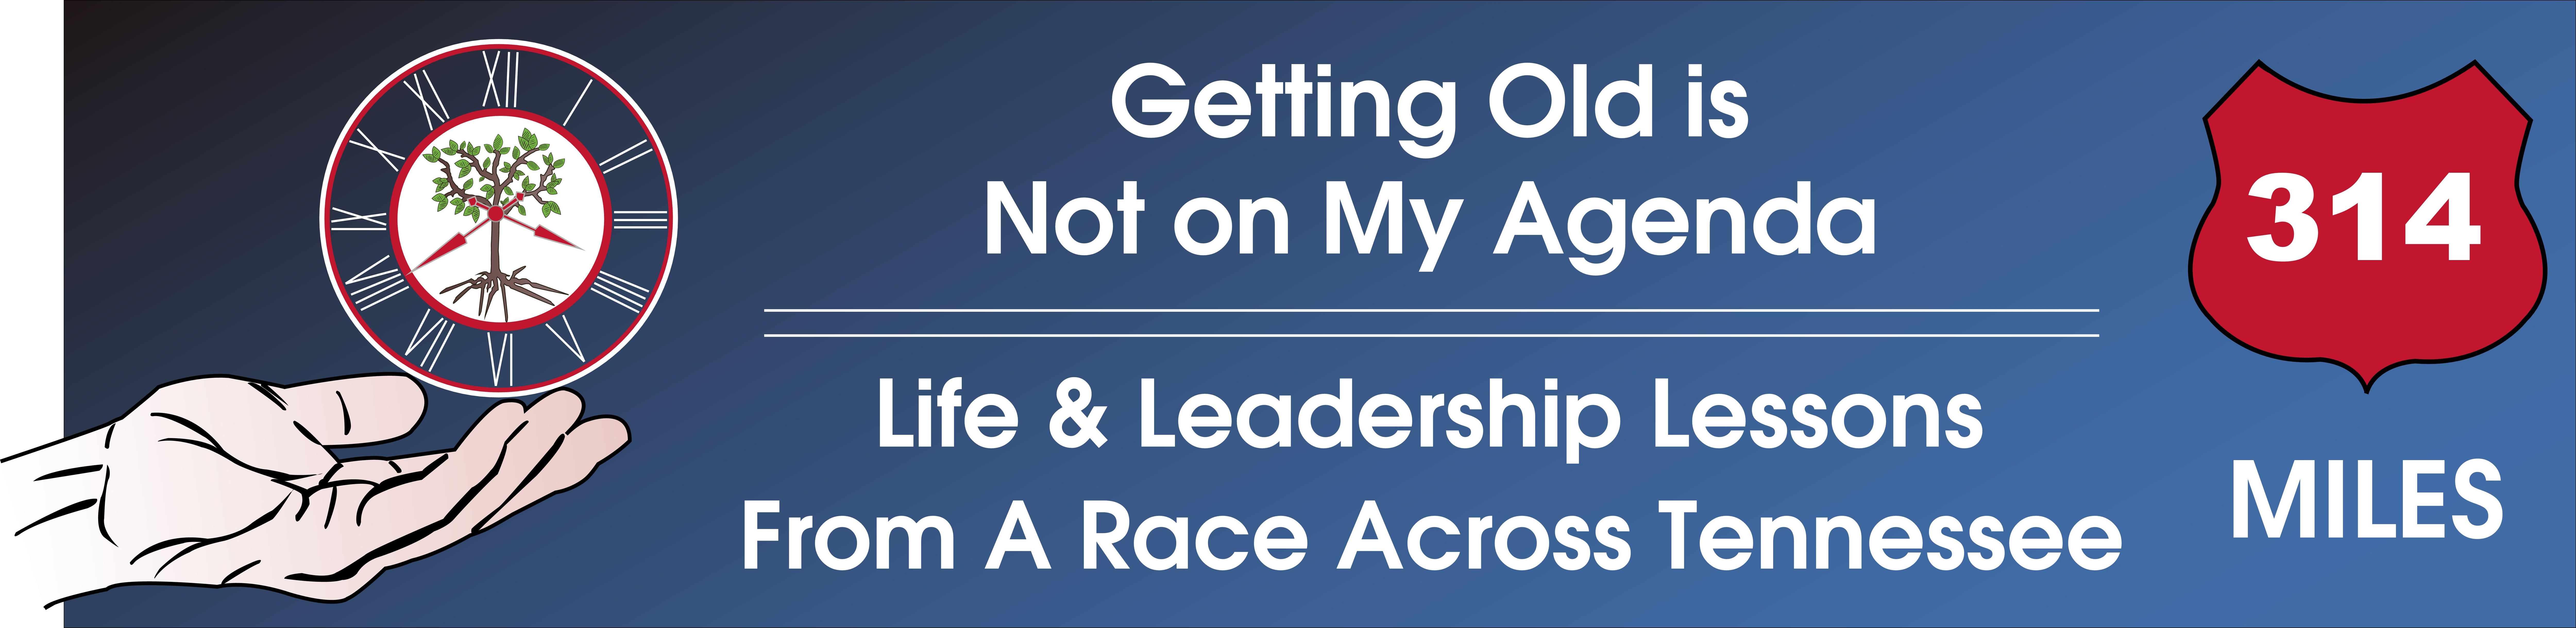 "Wordpress site banner for ""Getting Old..."" program"